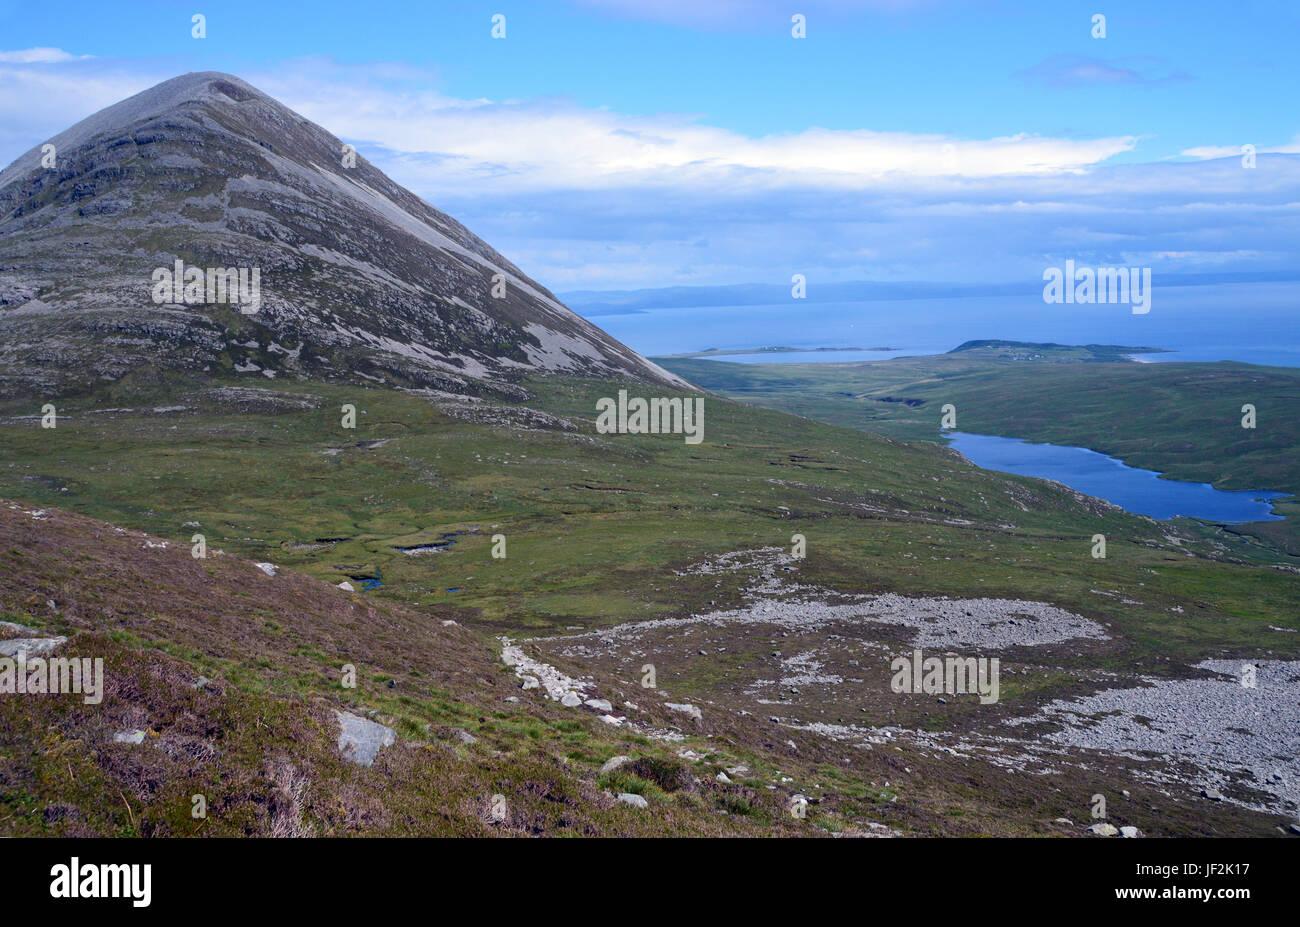 The Western Ridge of the Scottish Mountain Graham Beinn Shiantaidh from the Corbett Beinn an Oir (Paps of Jura) Stock Photo